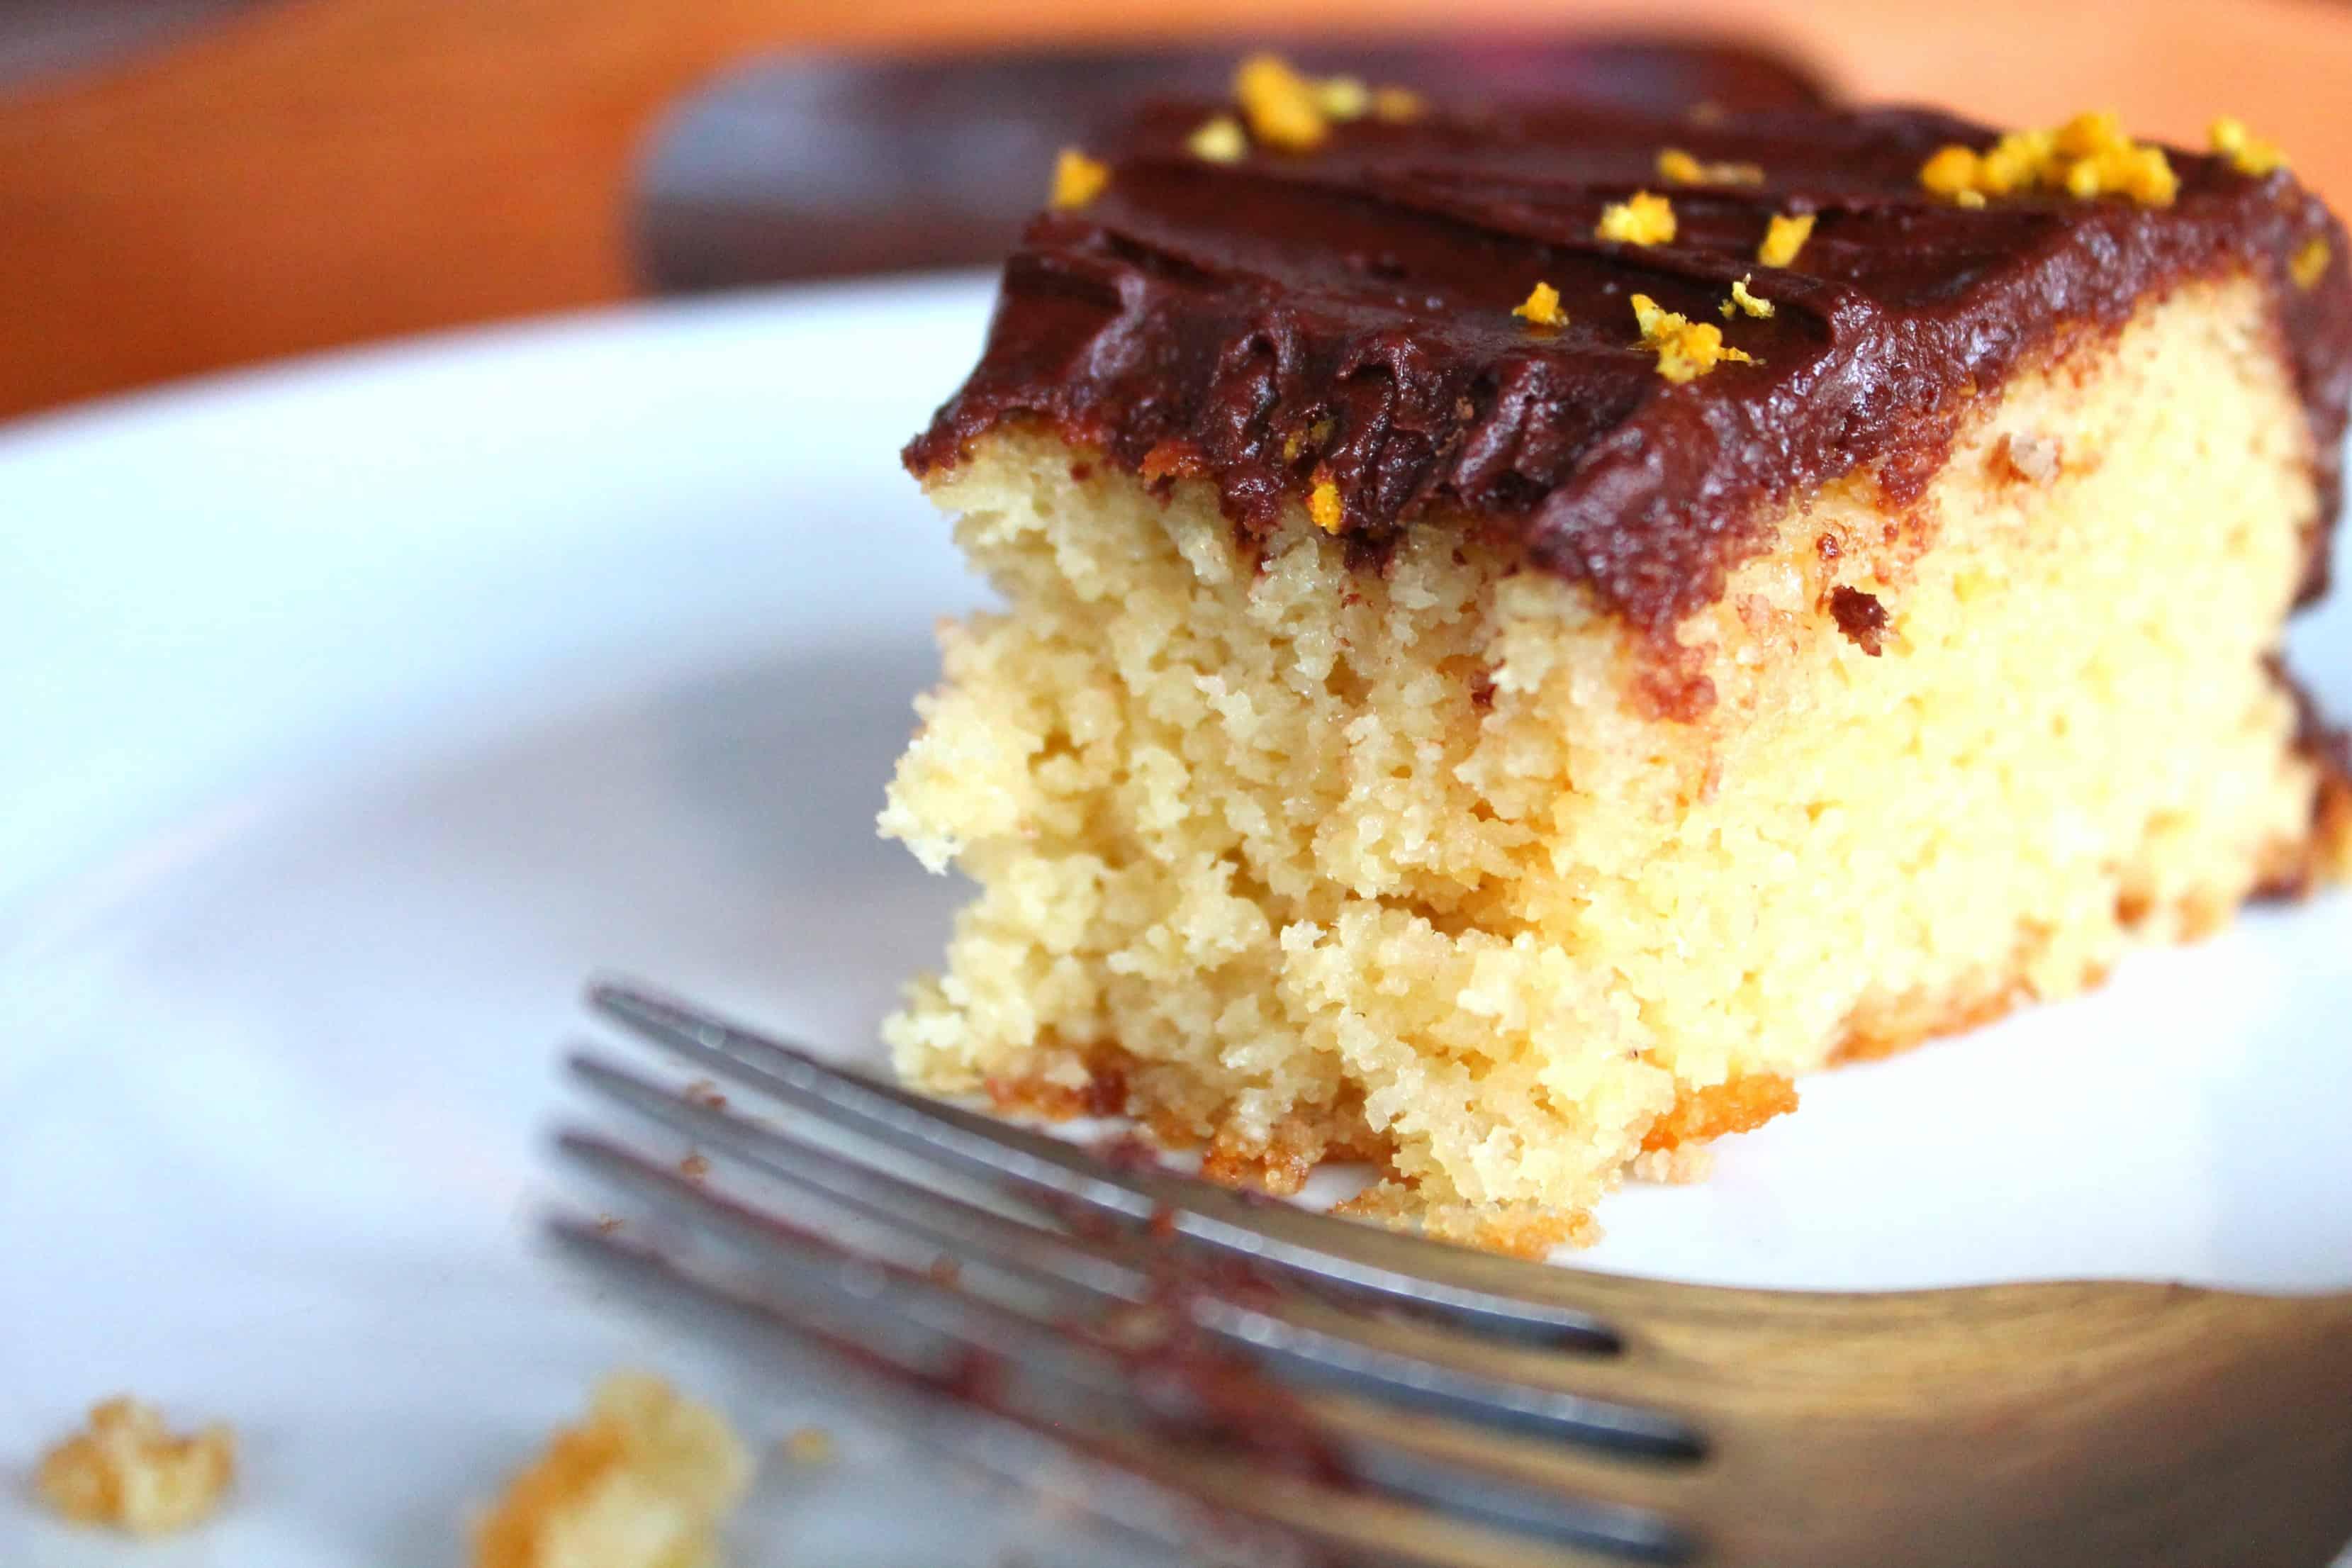 Vanilla Cake with Chocolate Espresso Frosting, paleo, gluten free,